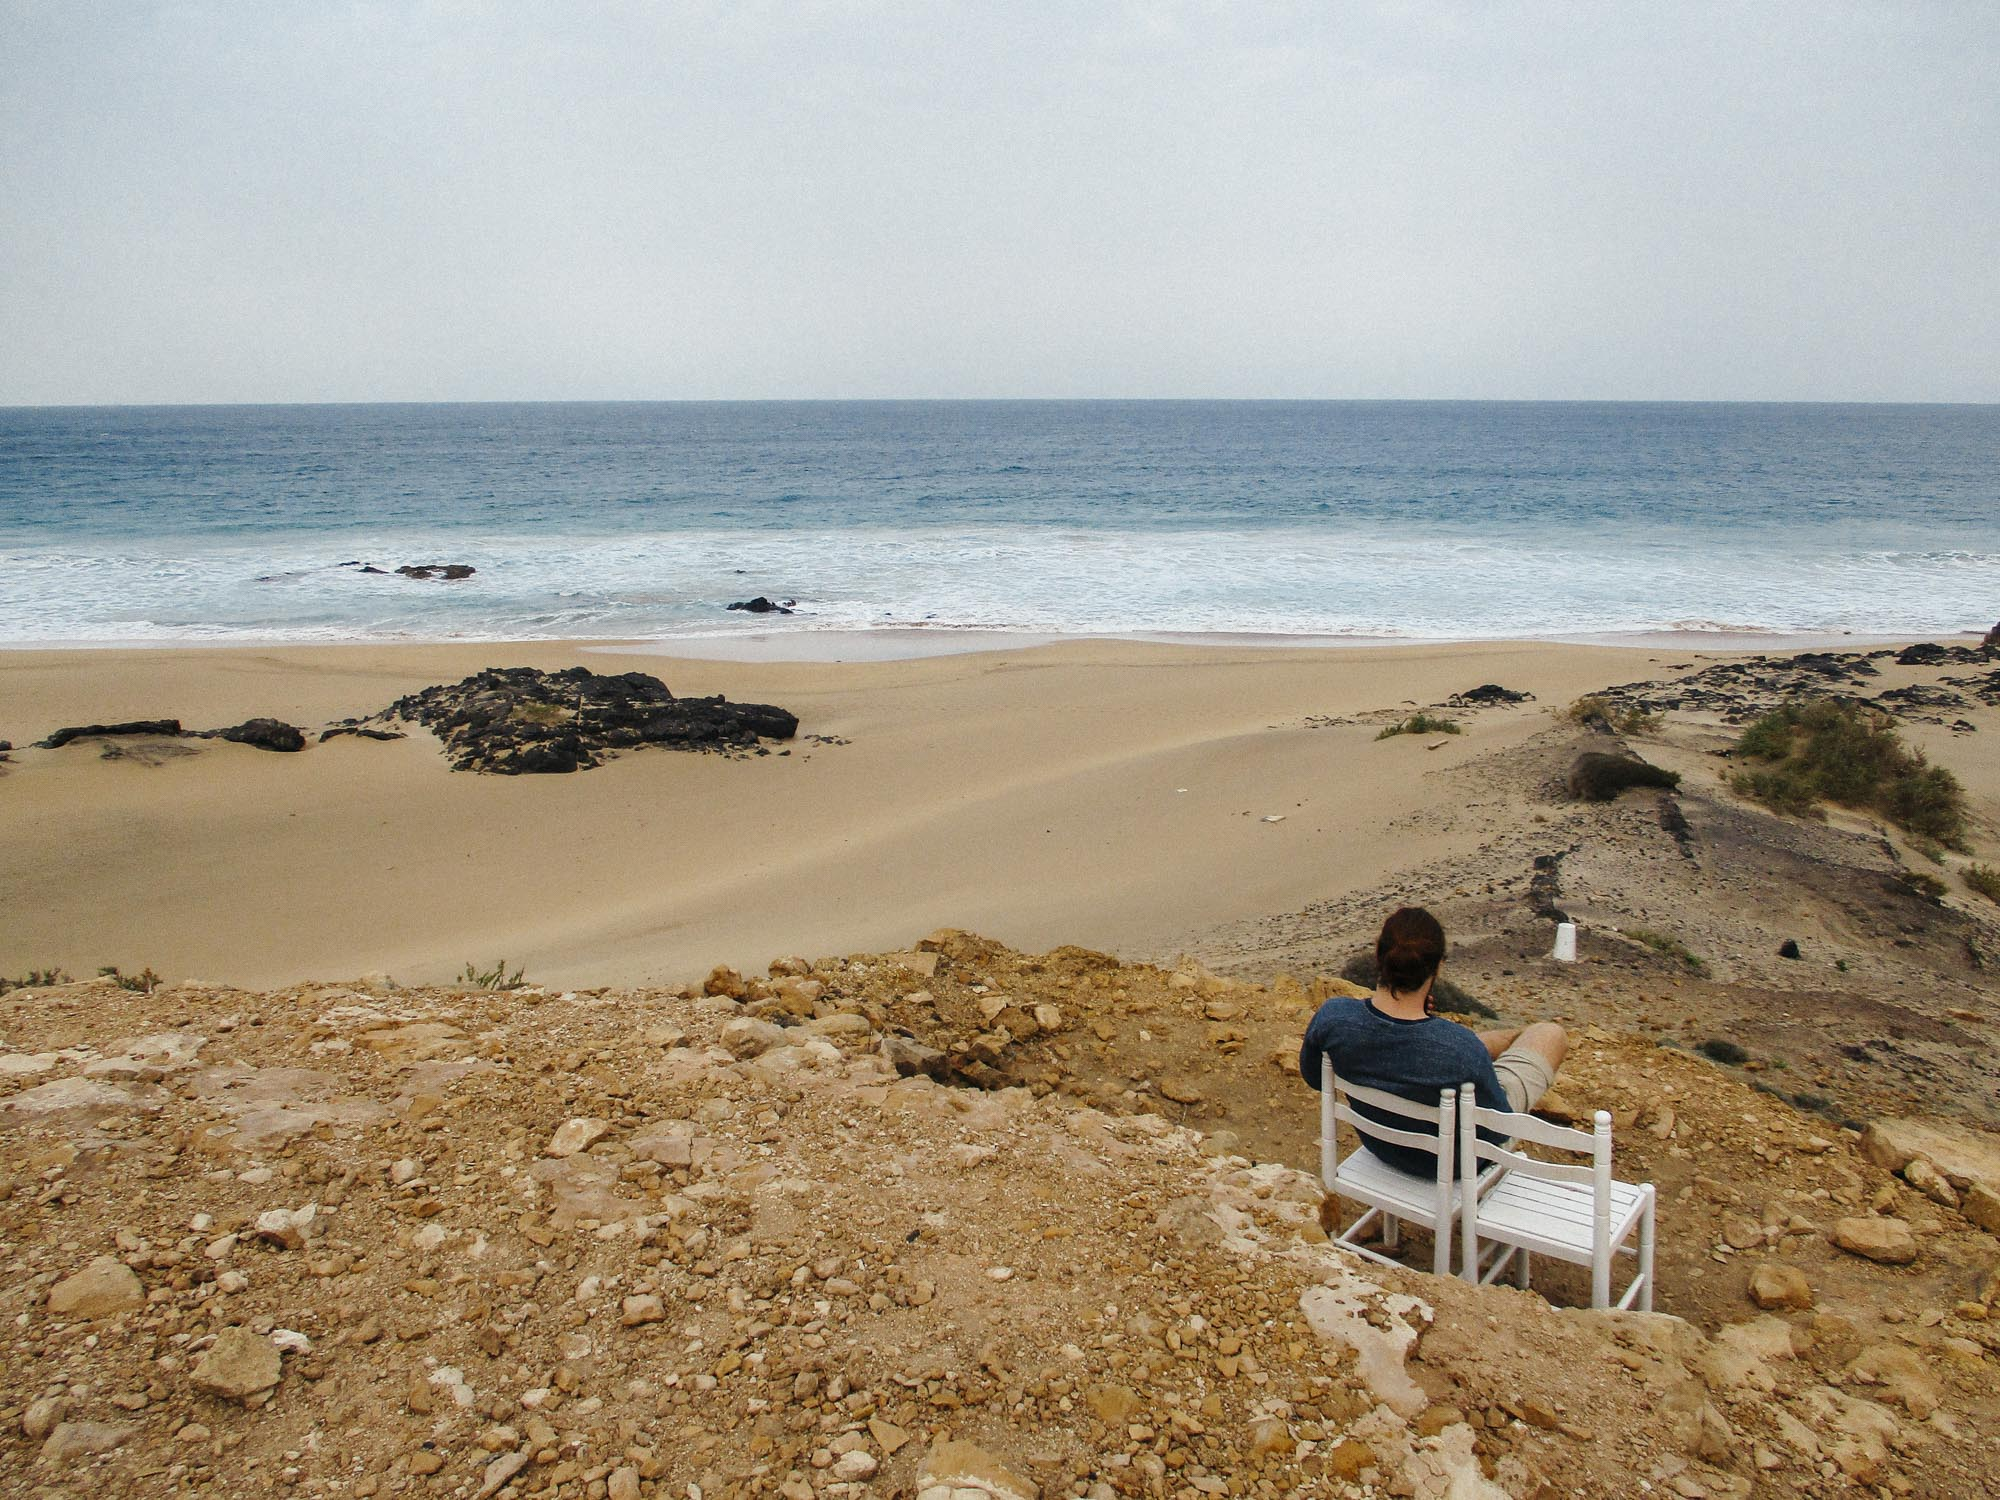 190215_Fuerteventura Kleine KameraIMG_2050.jpg